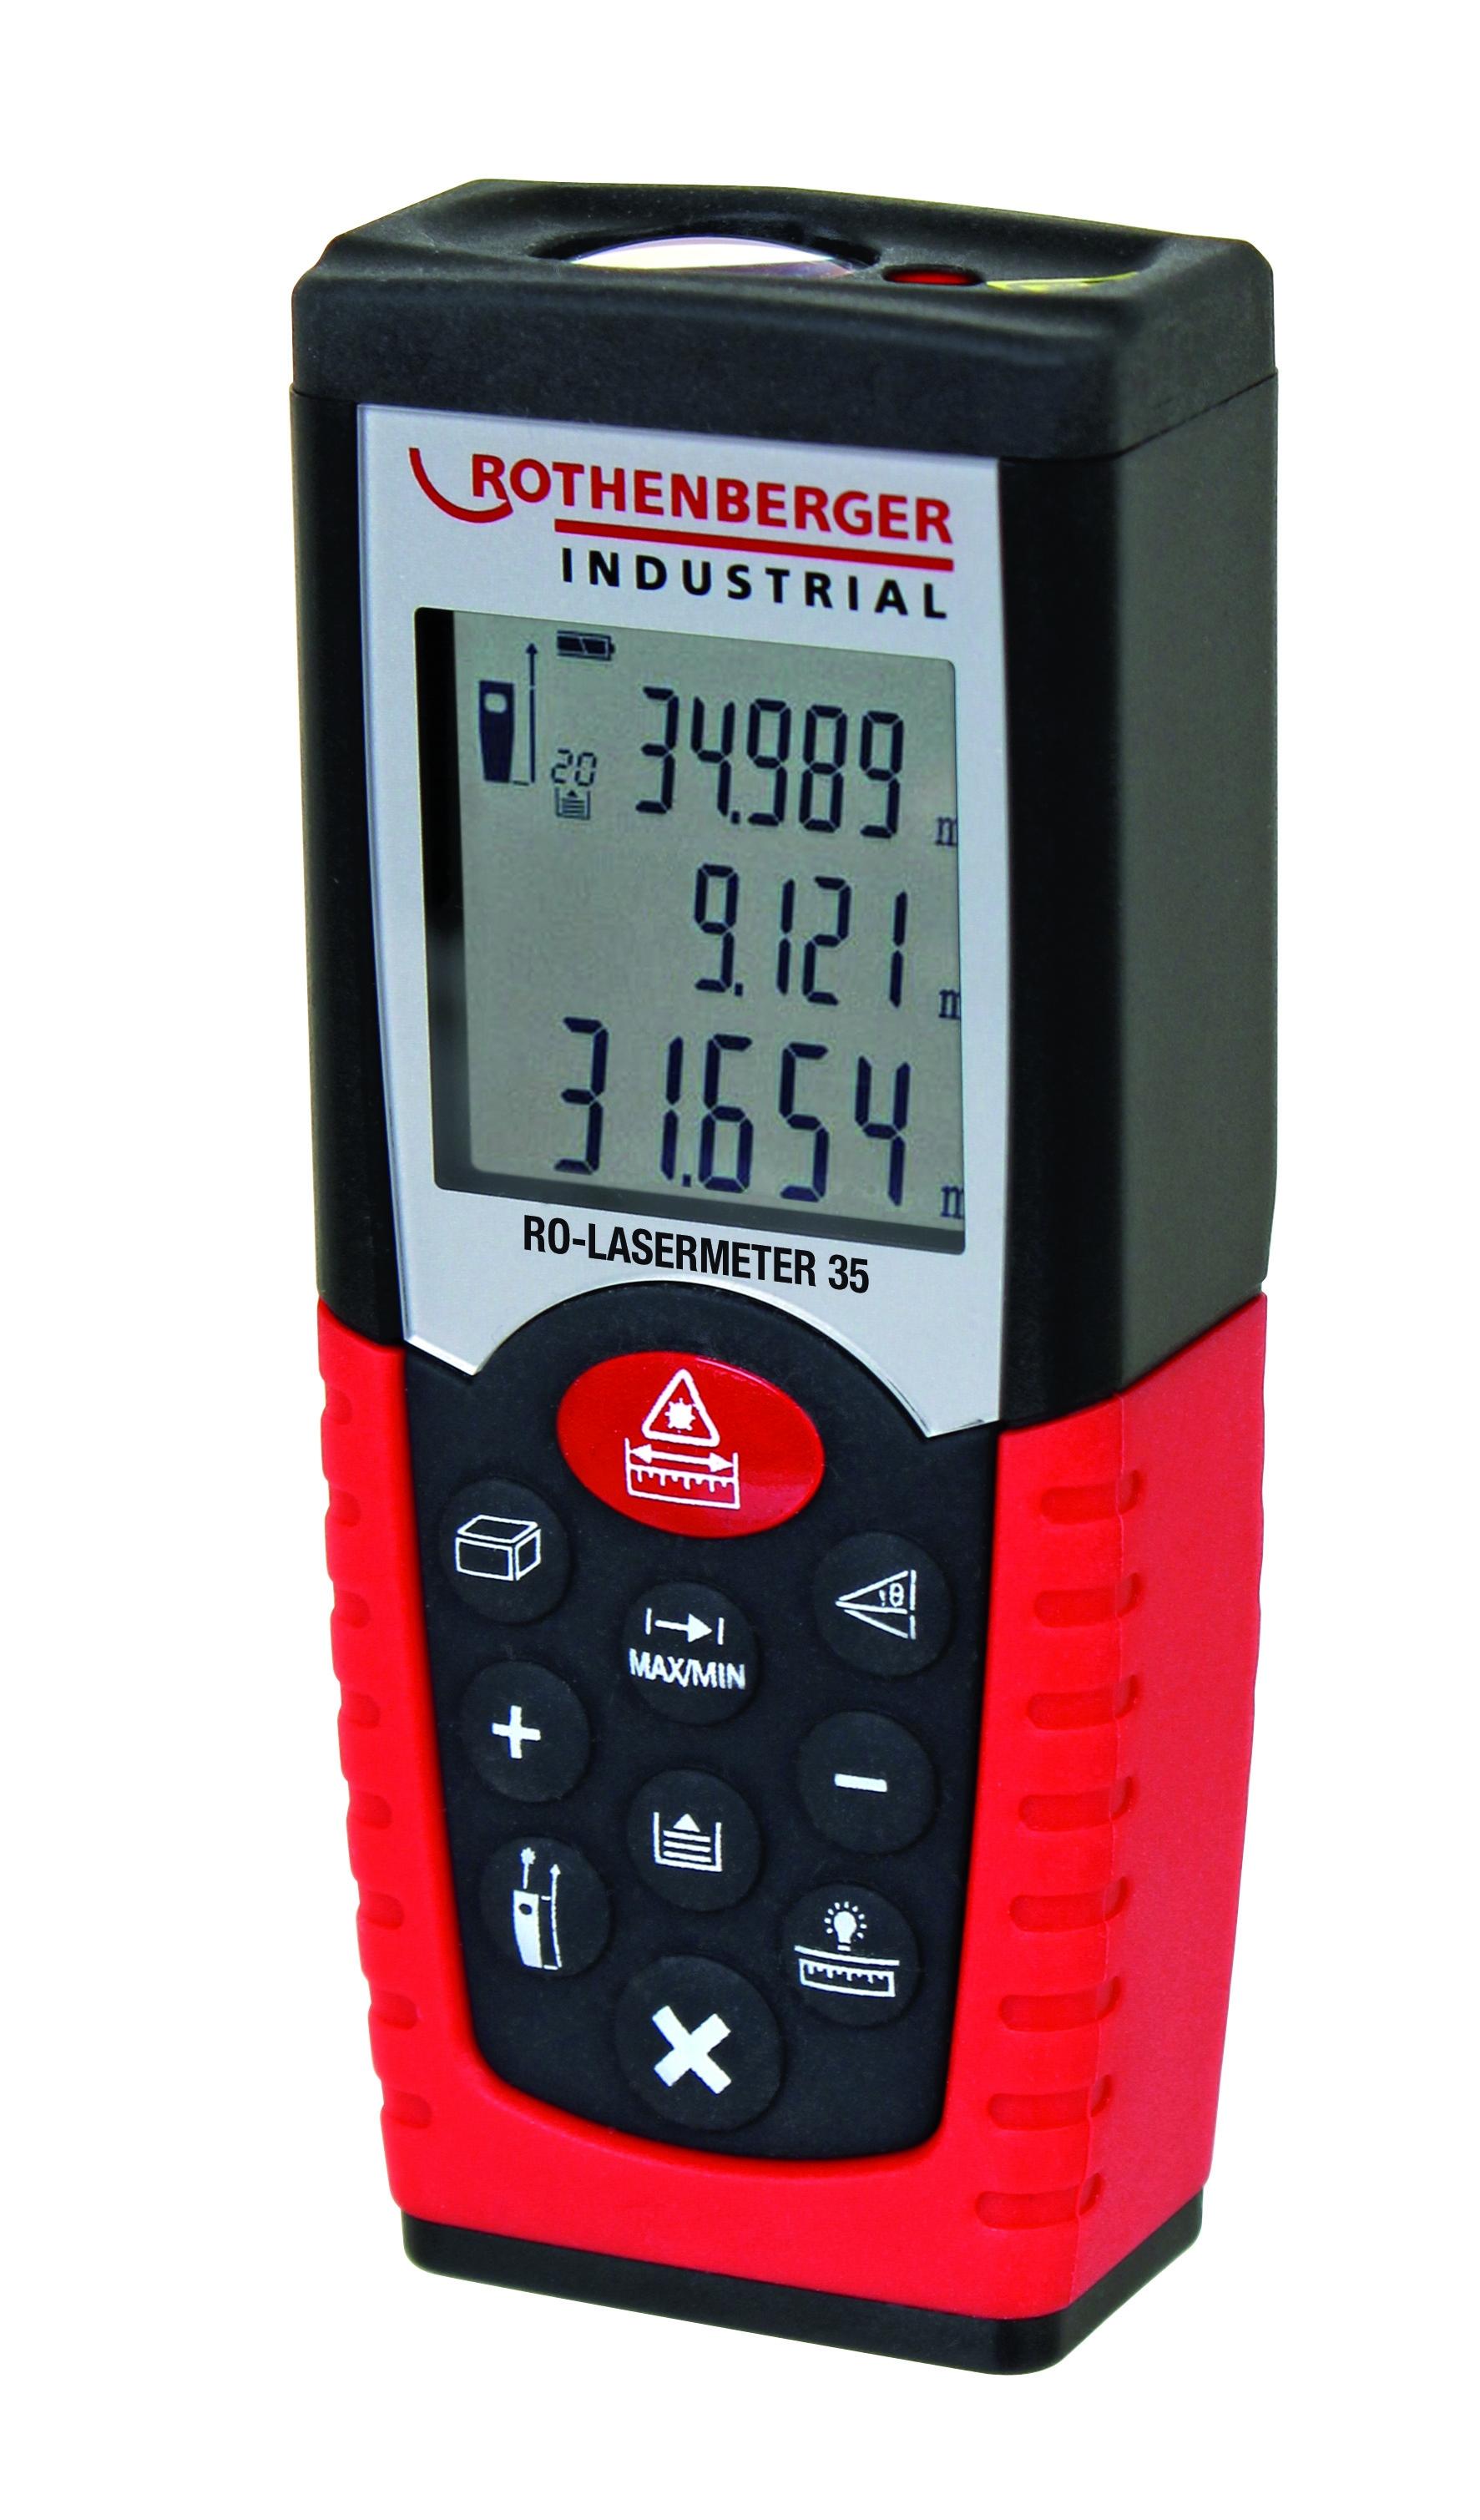 Rothenberger Industrial Laser-Distanz-Messgerät 35m [NORMA24]